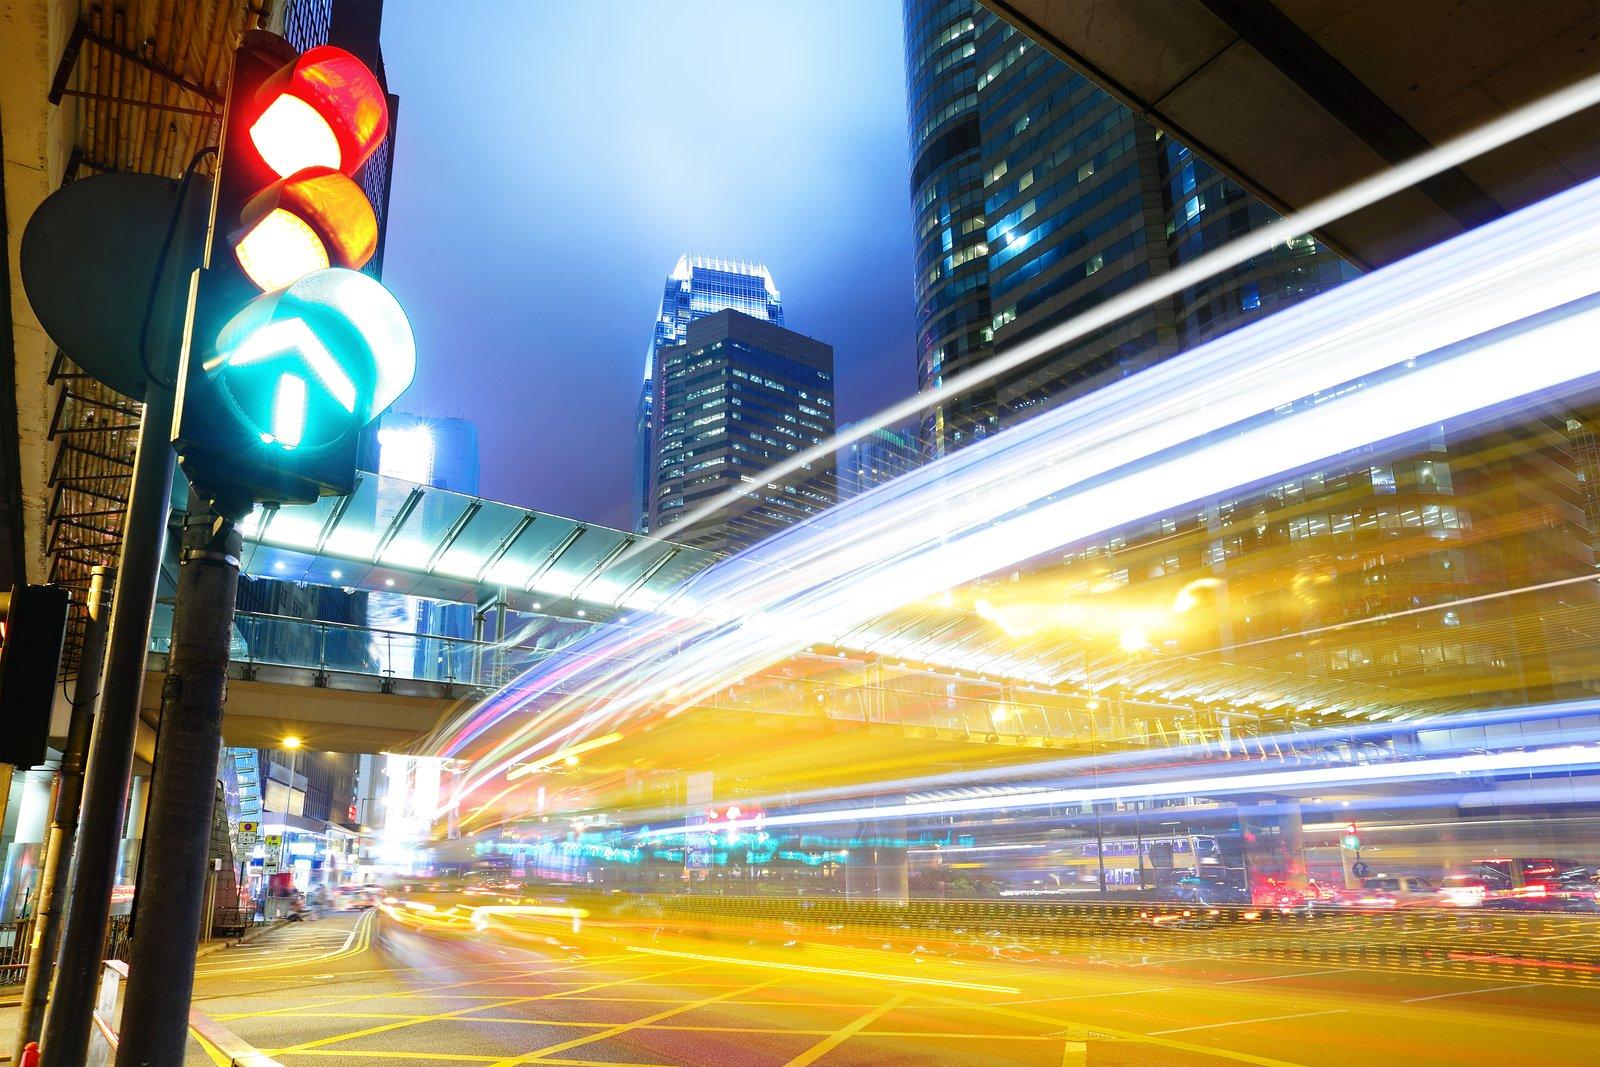 Technology News: The Next Waze? Social Public Transportation App Moovit Raises $28M